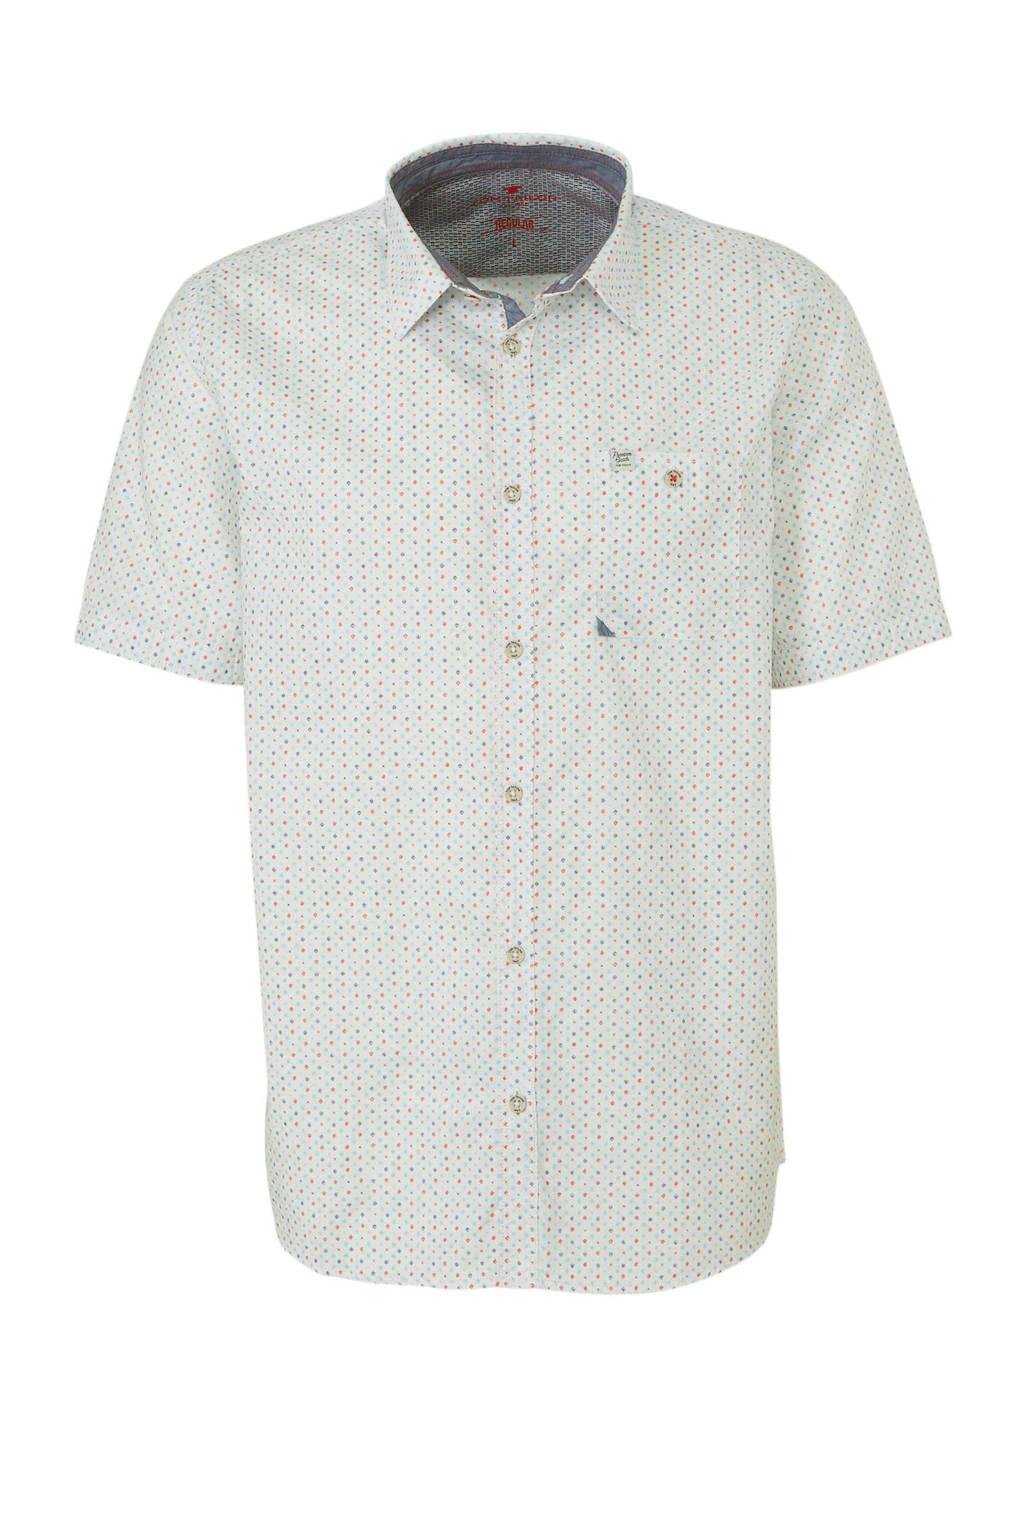 Tom Tailor regular fit overhemd met all over print wit/rood/blauw, Wit/rood/blauw